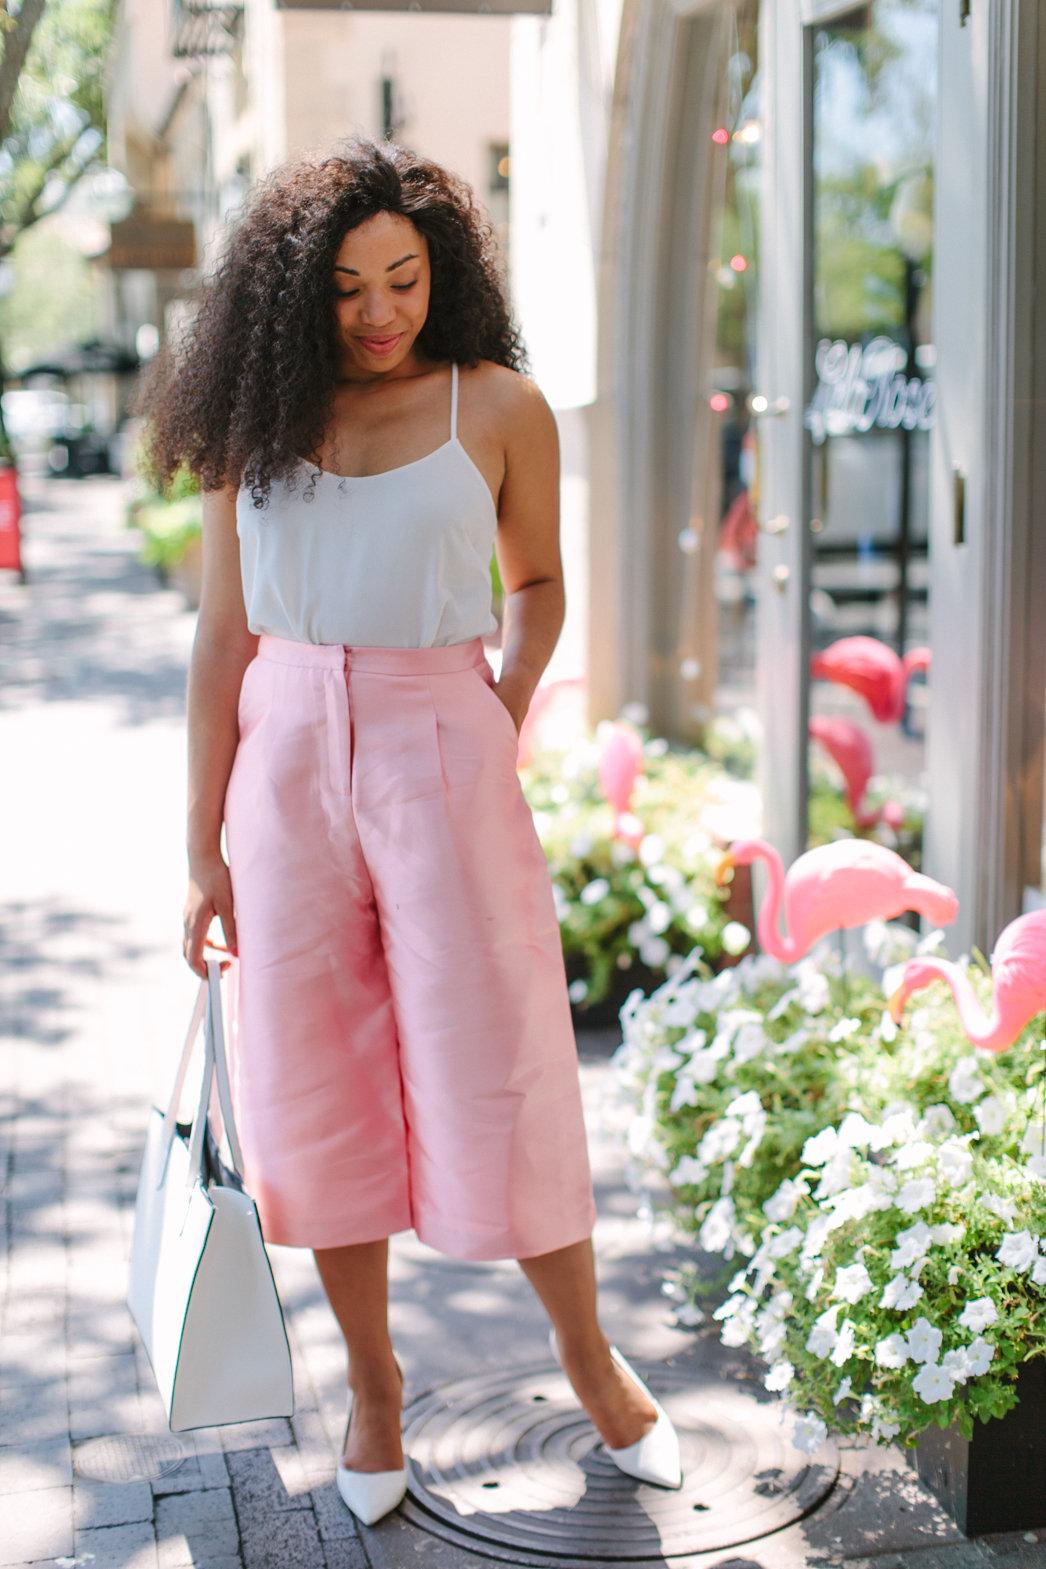 Kaylah-Burton-nyc-fashion-blogger-style-me-twice-1172